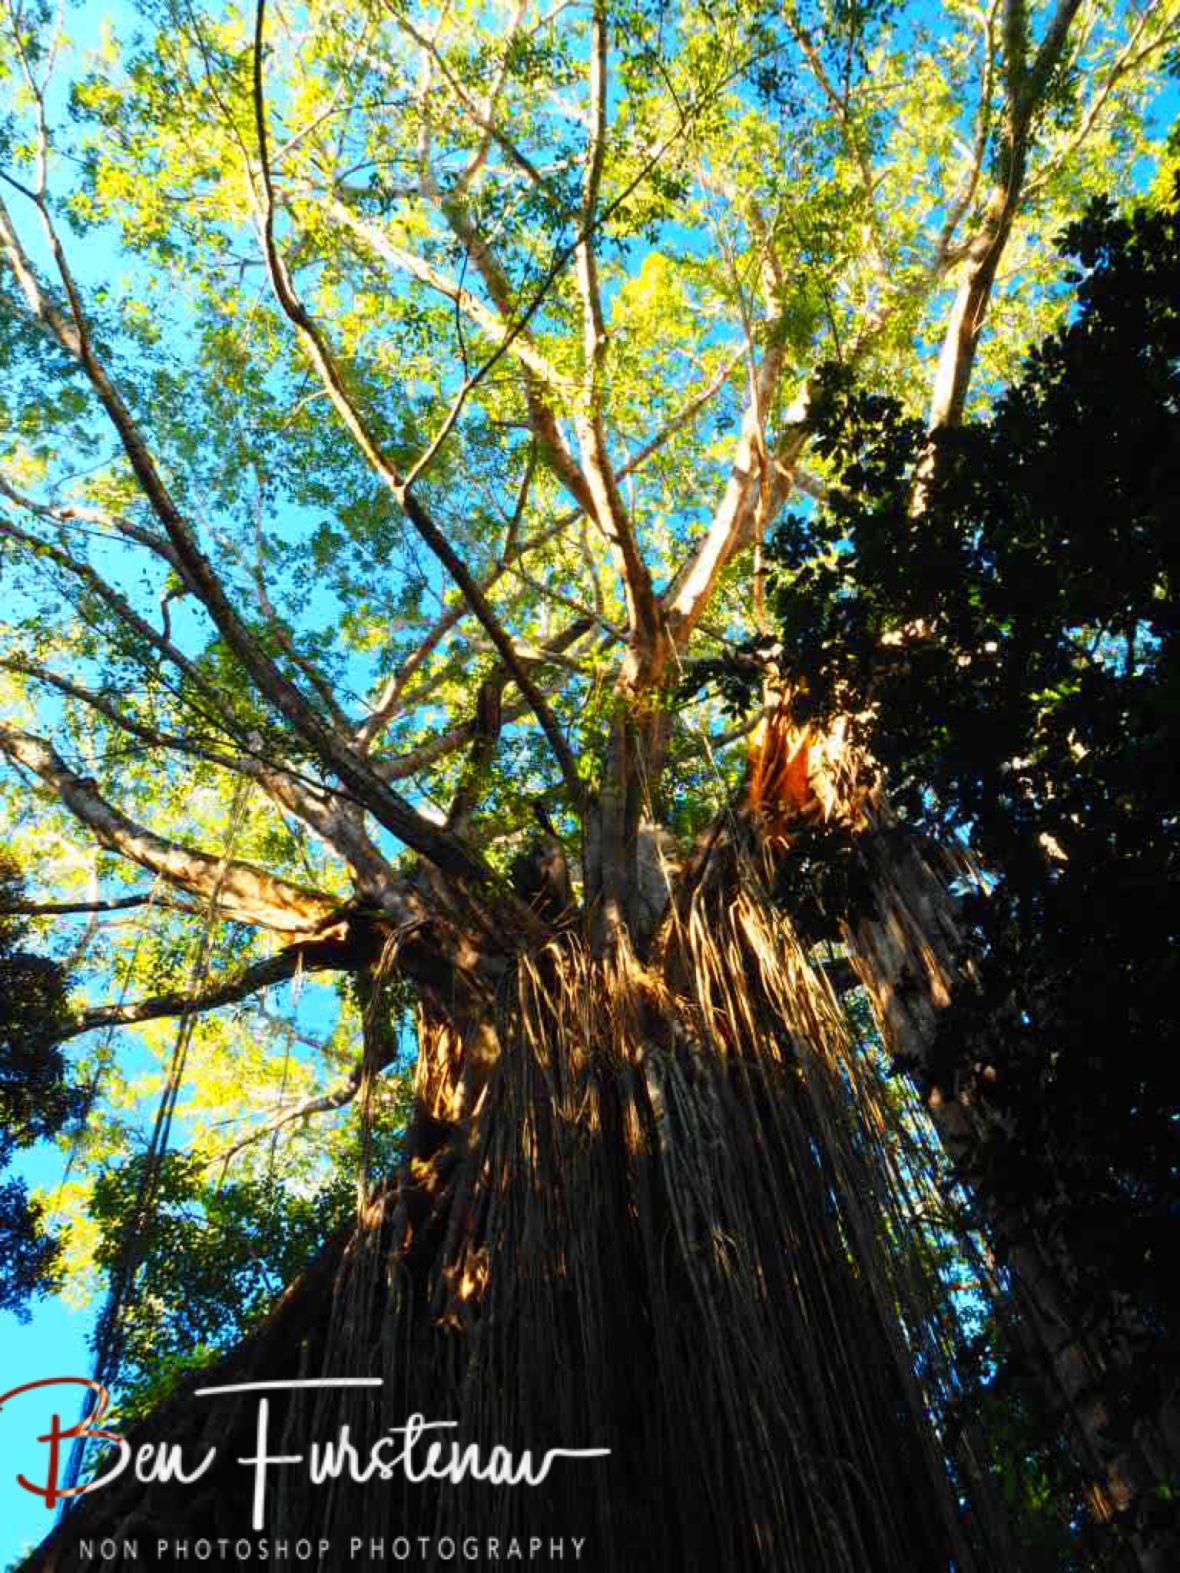 Fig tree in blue skies st Atherton Tablelands, Far North Queensland, Australia